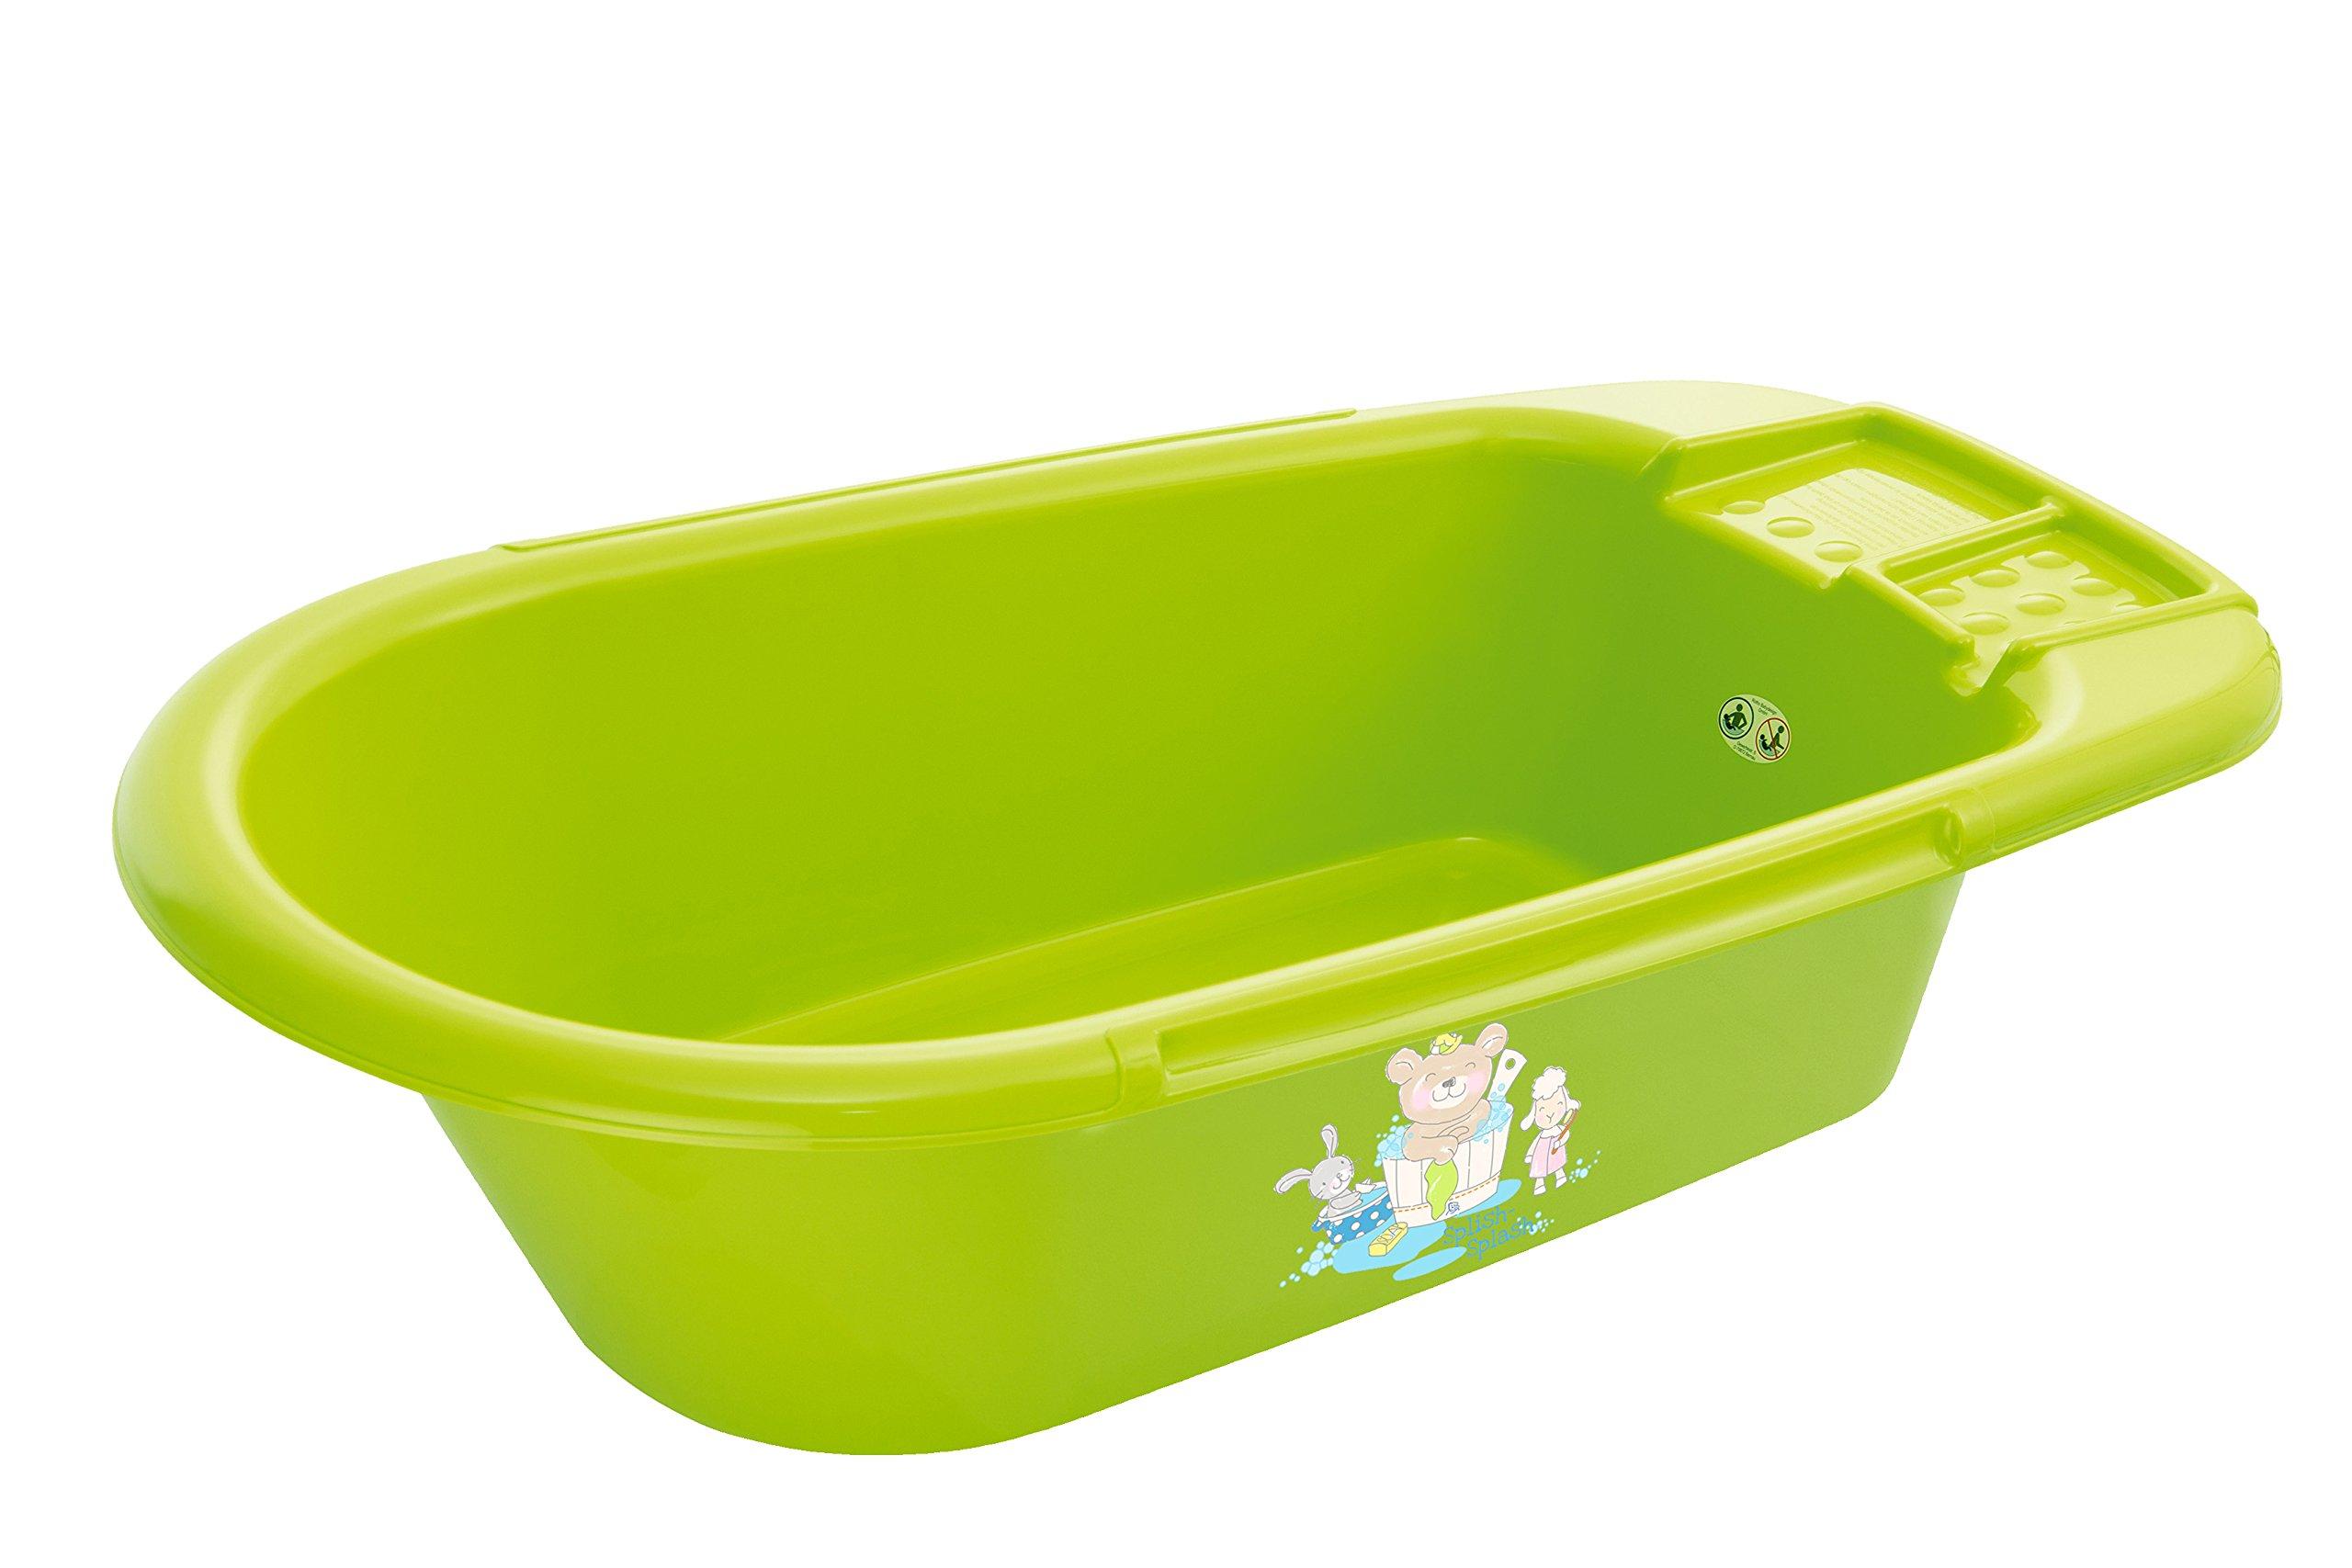 Rotho Babydesign Best Friends BB Bath Tub